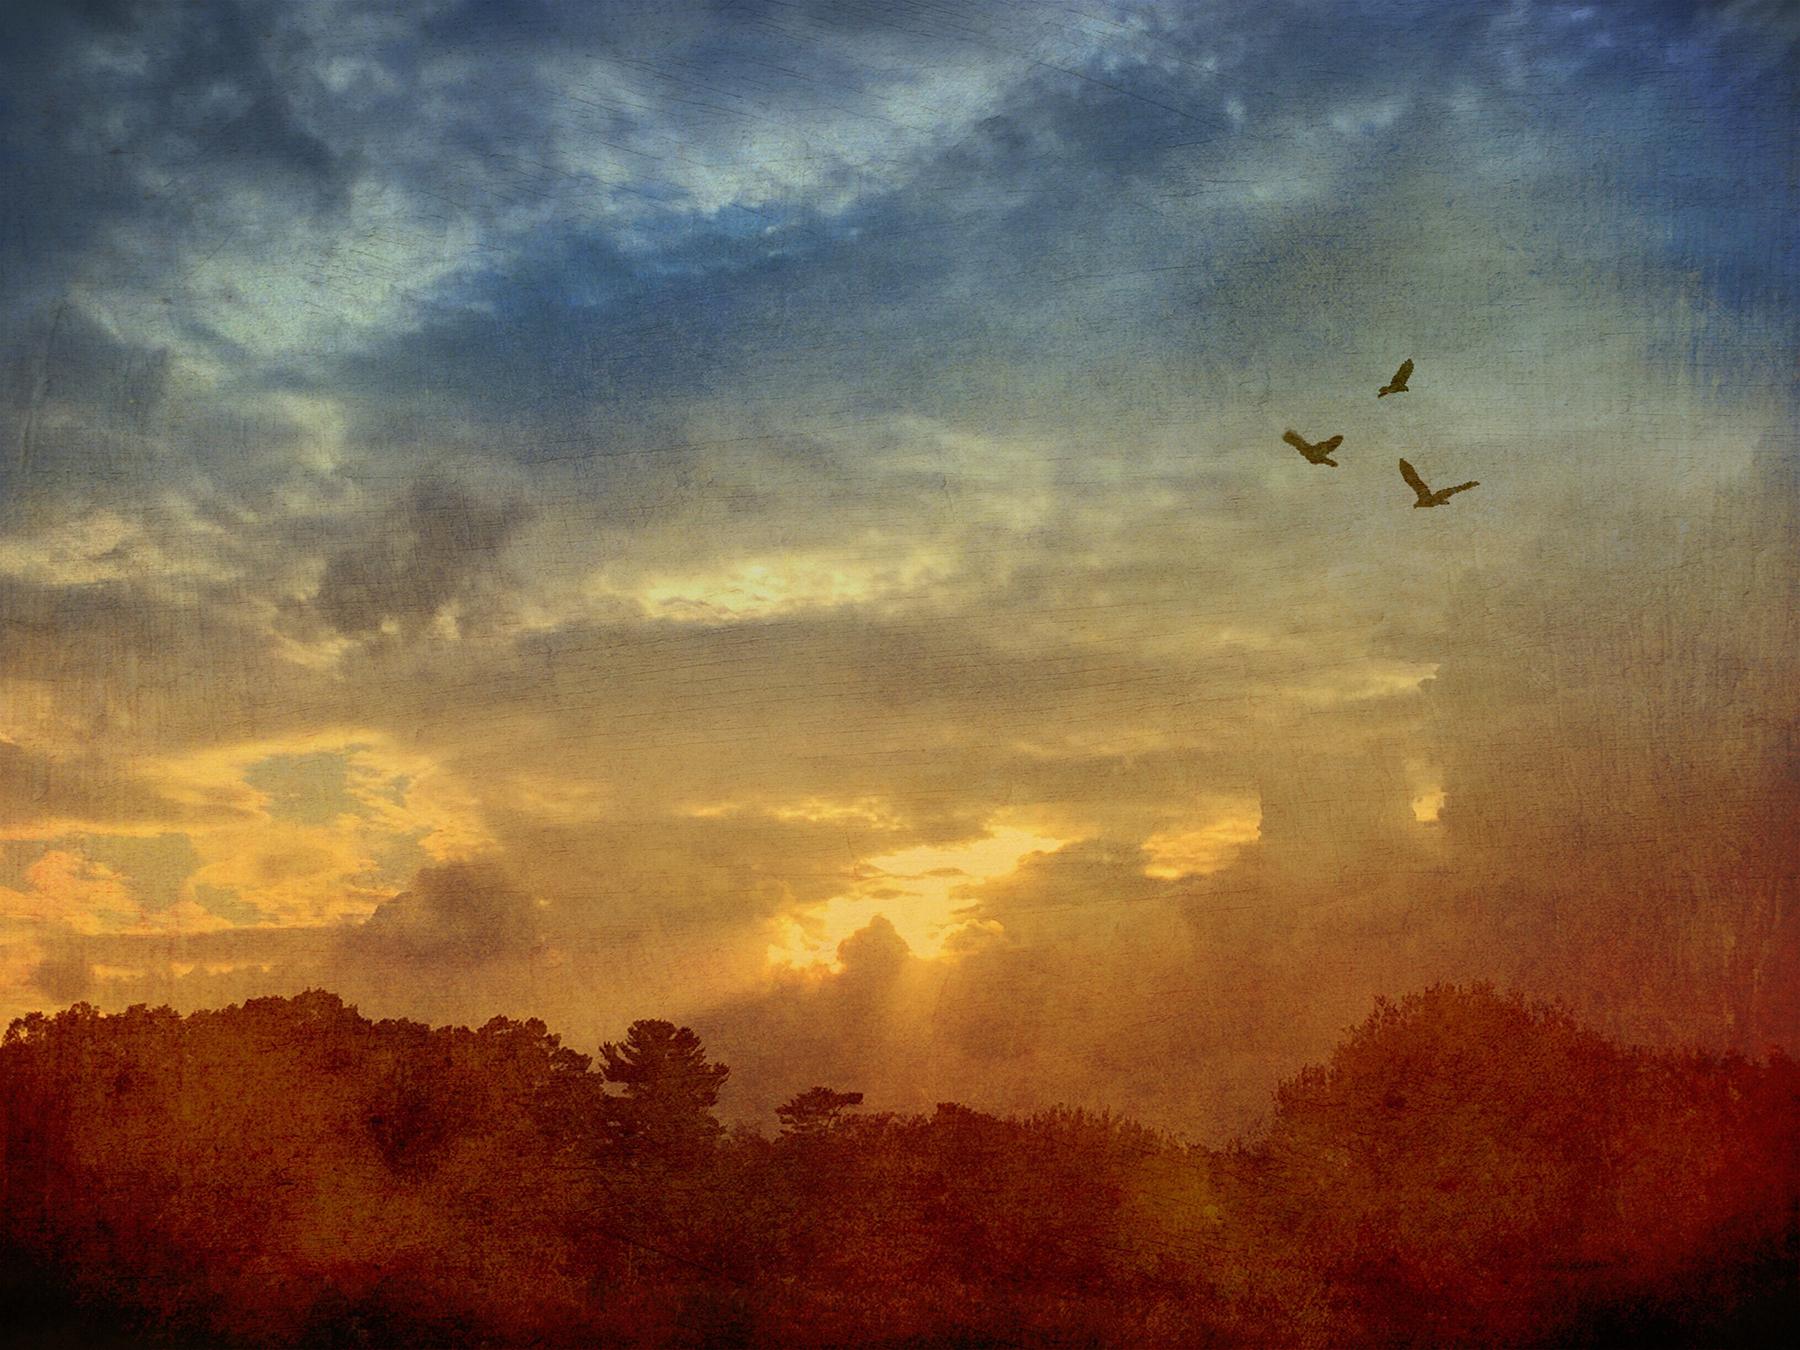 Catherine_Caddigan_Sunset.jpg